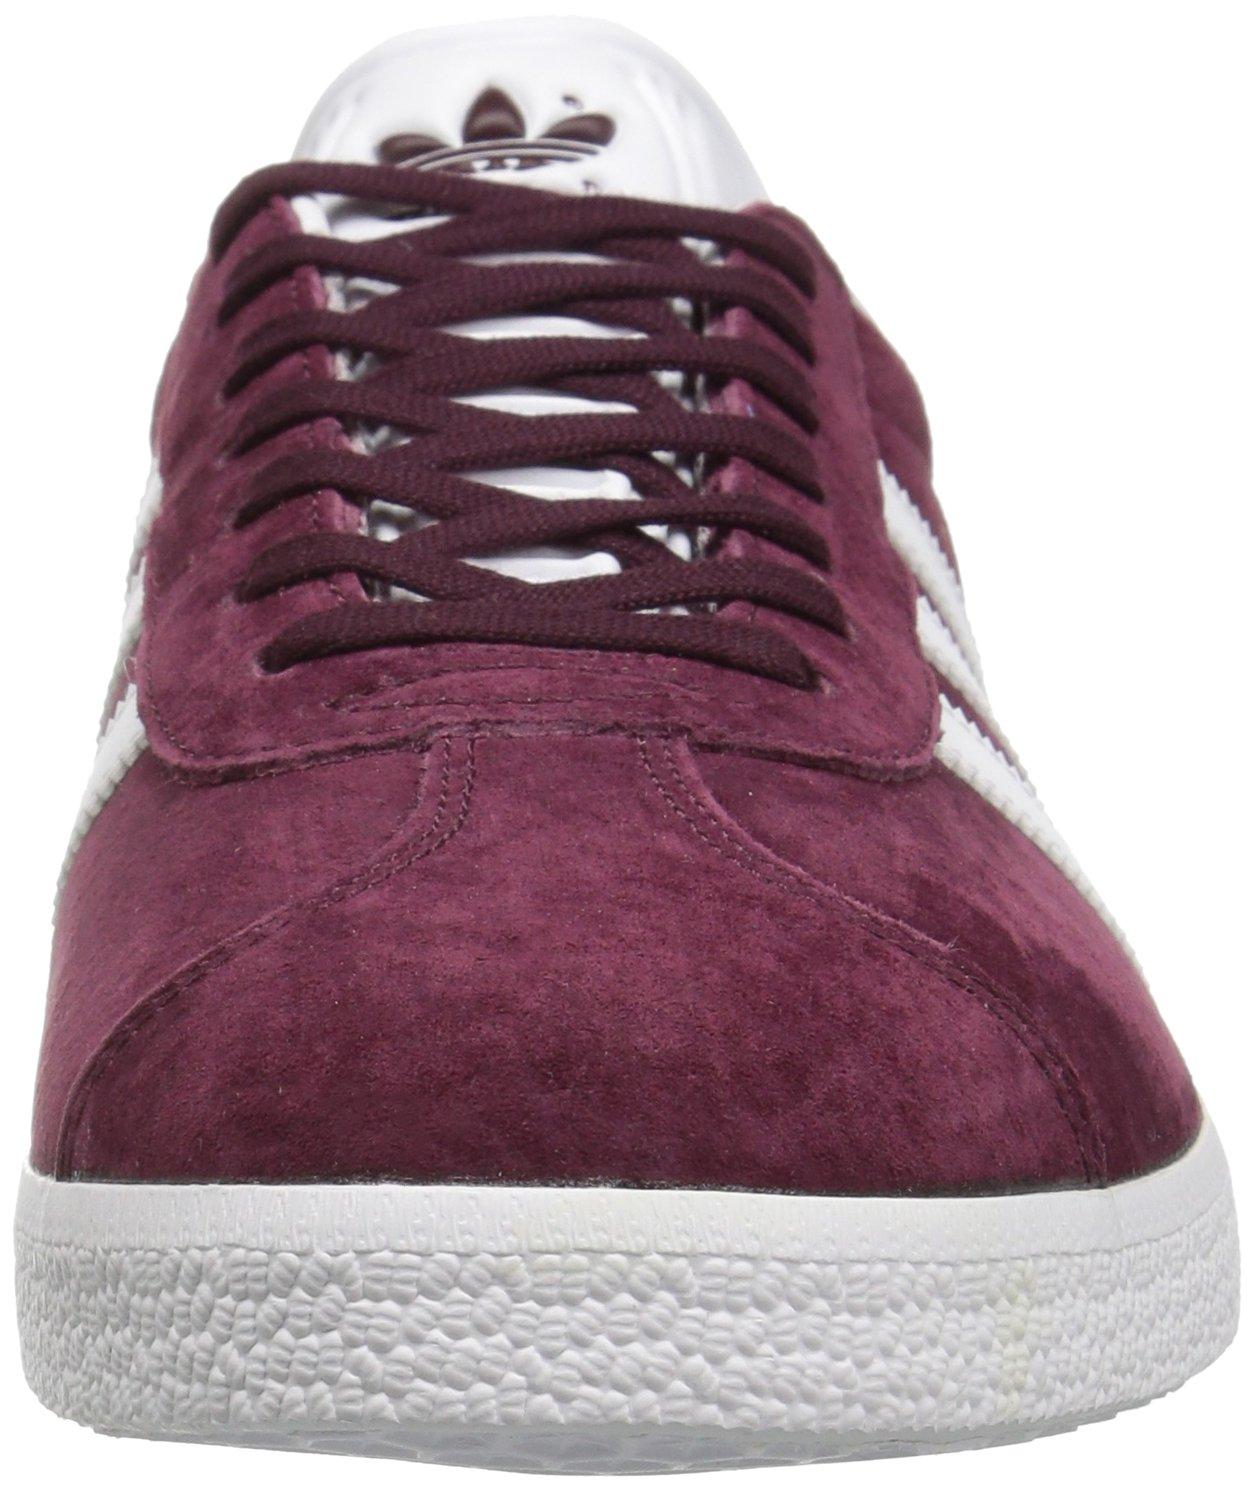 adidas B01HHJS2K6 Men's Gazelle Casual Sneakers B01HHJS2K6 adidas 13 M US|Maroon/White/Metallic/Gold 14a3b7